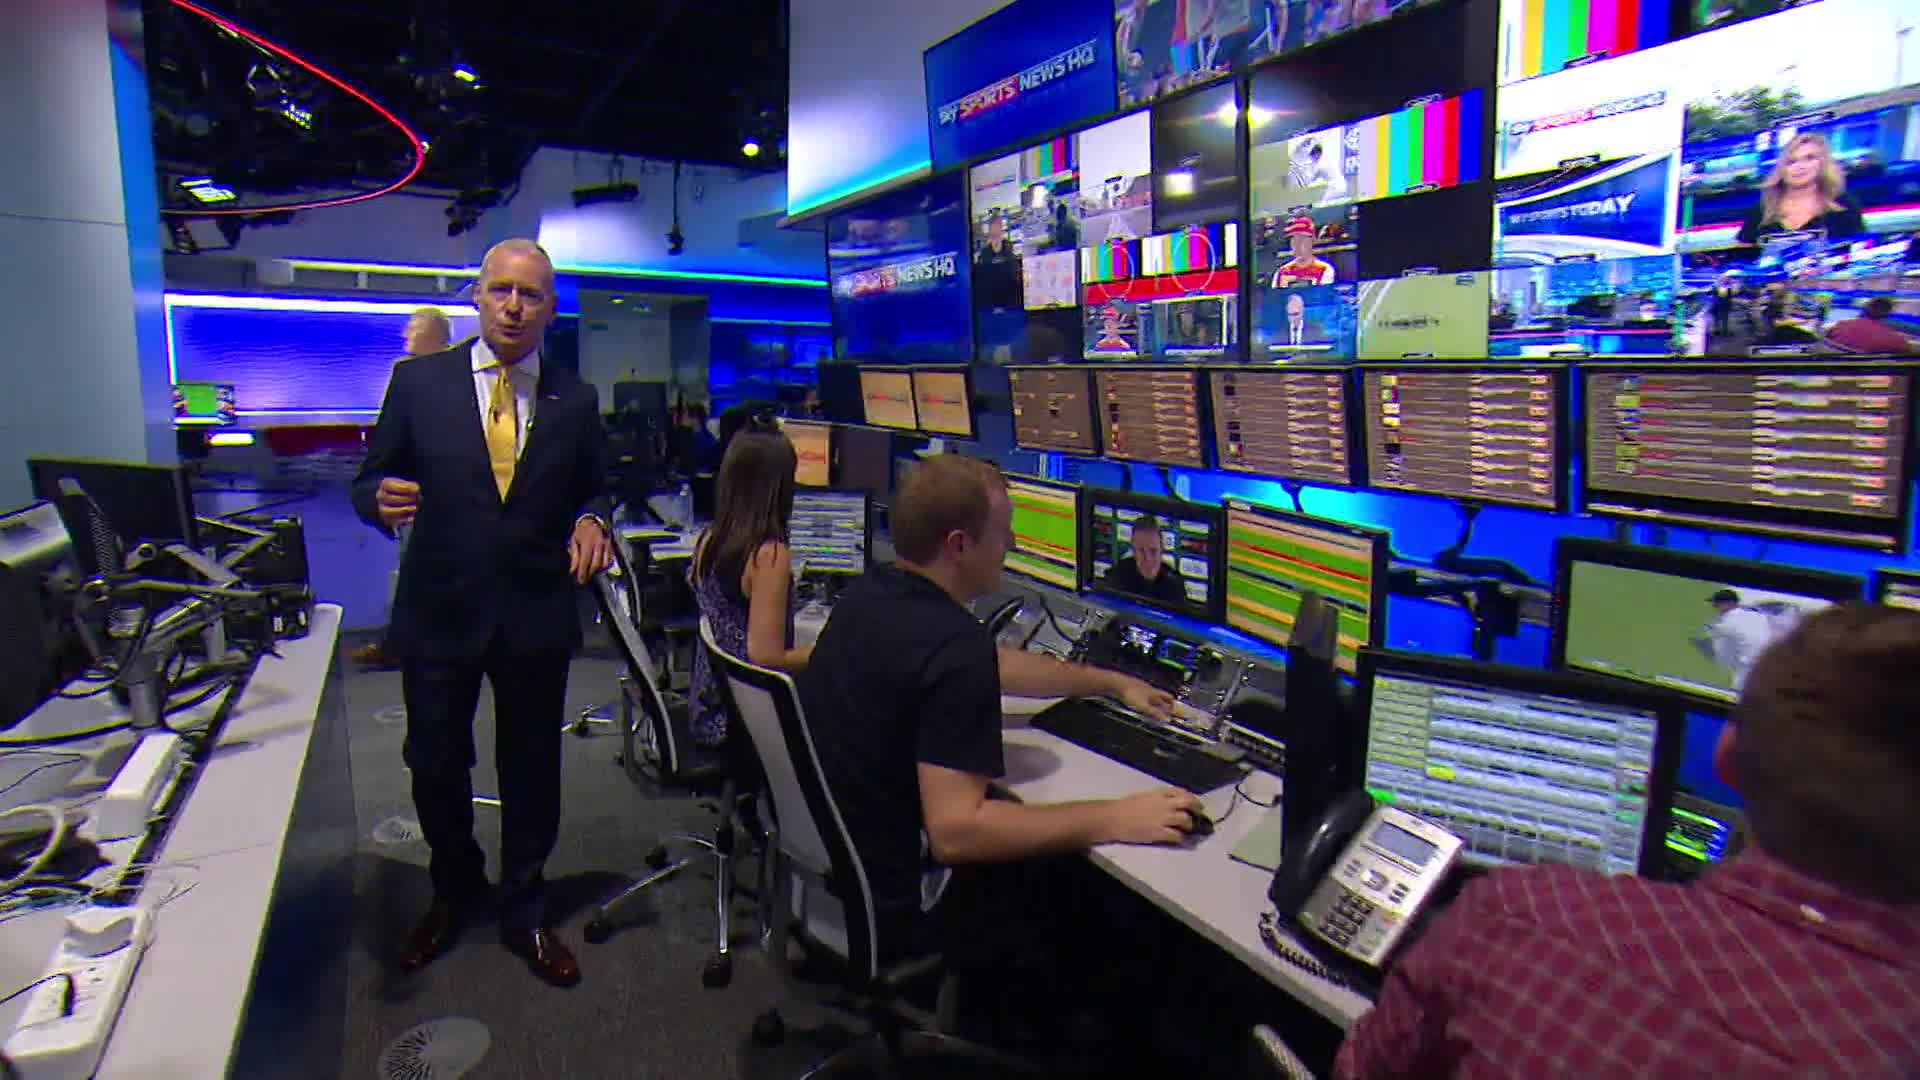 Sky news room